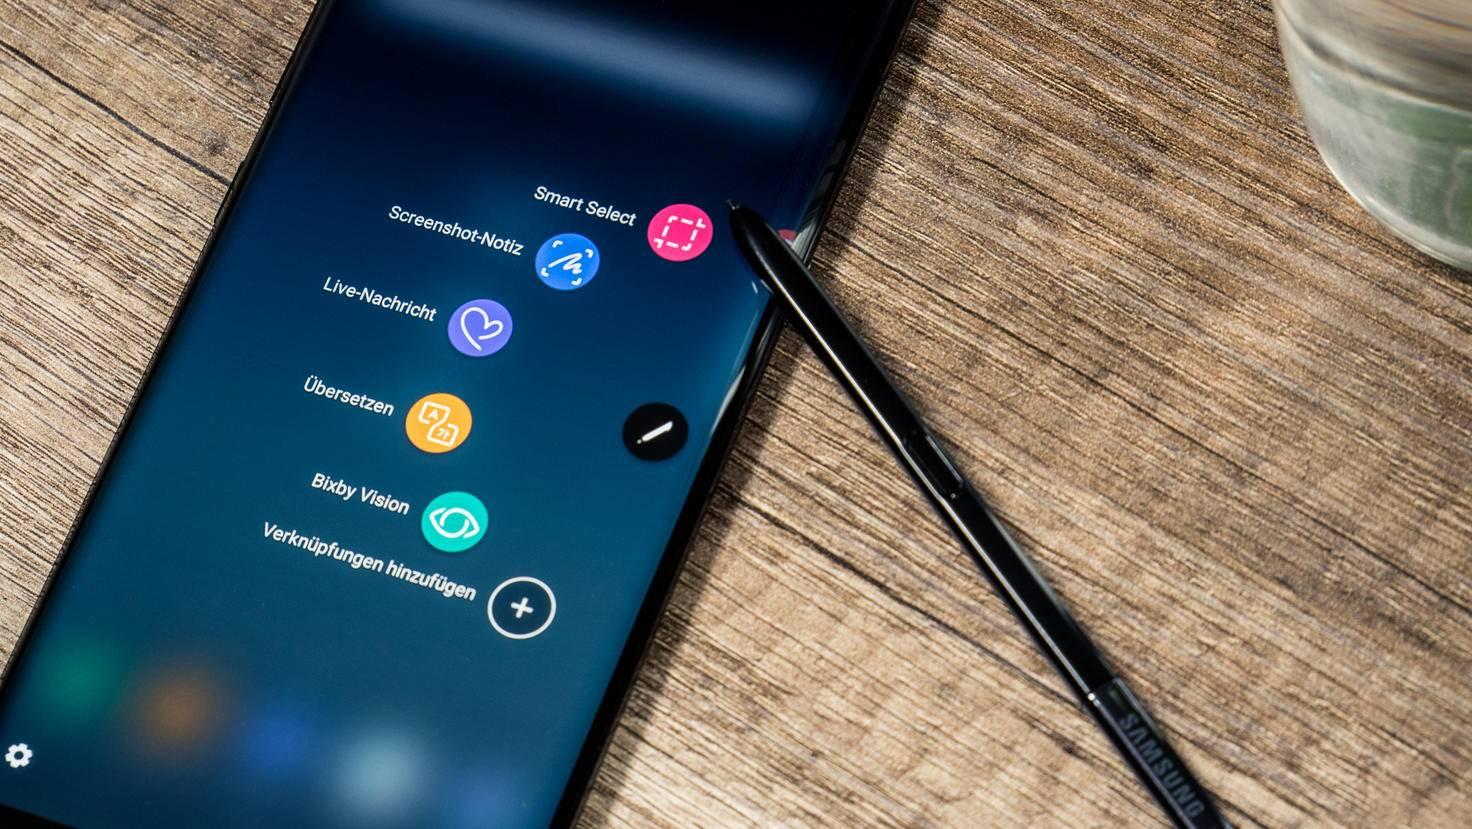 Samsung-Galaxy-Note-8-final-01